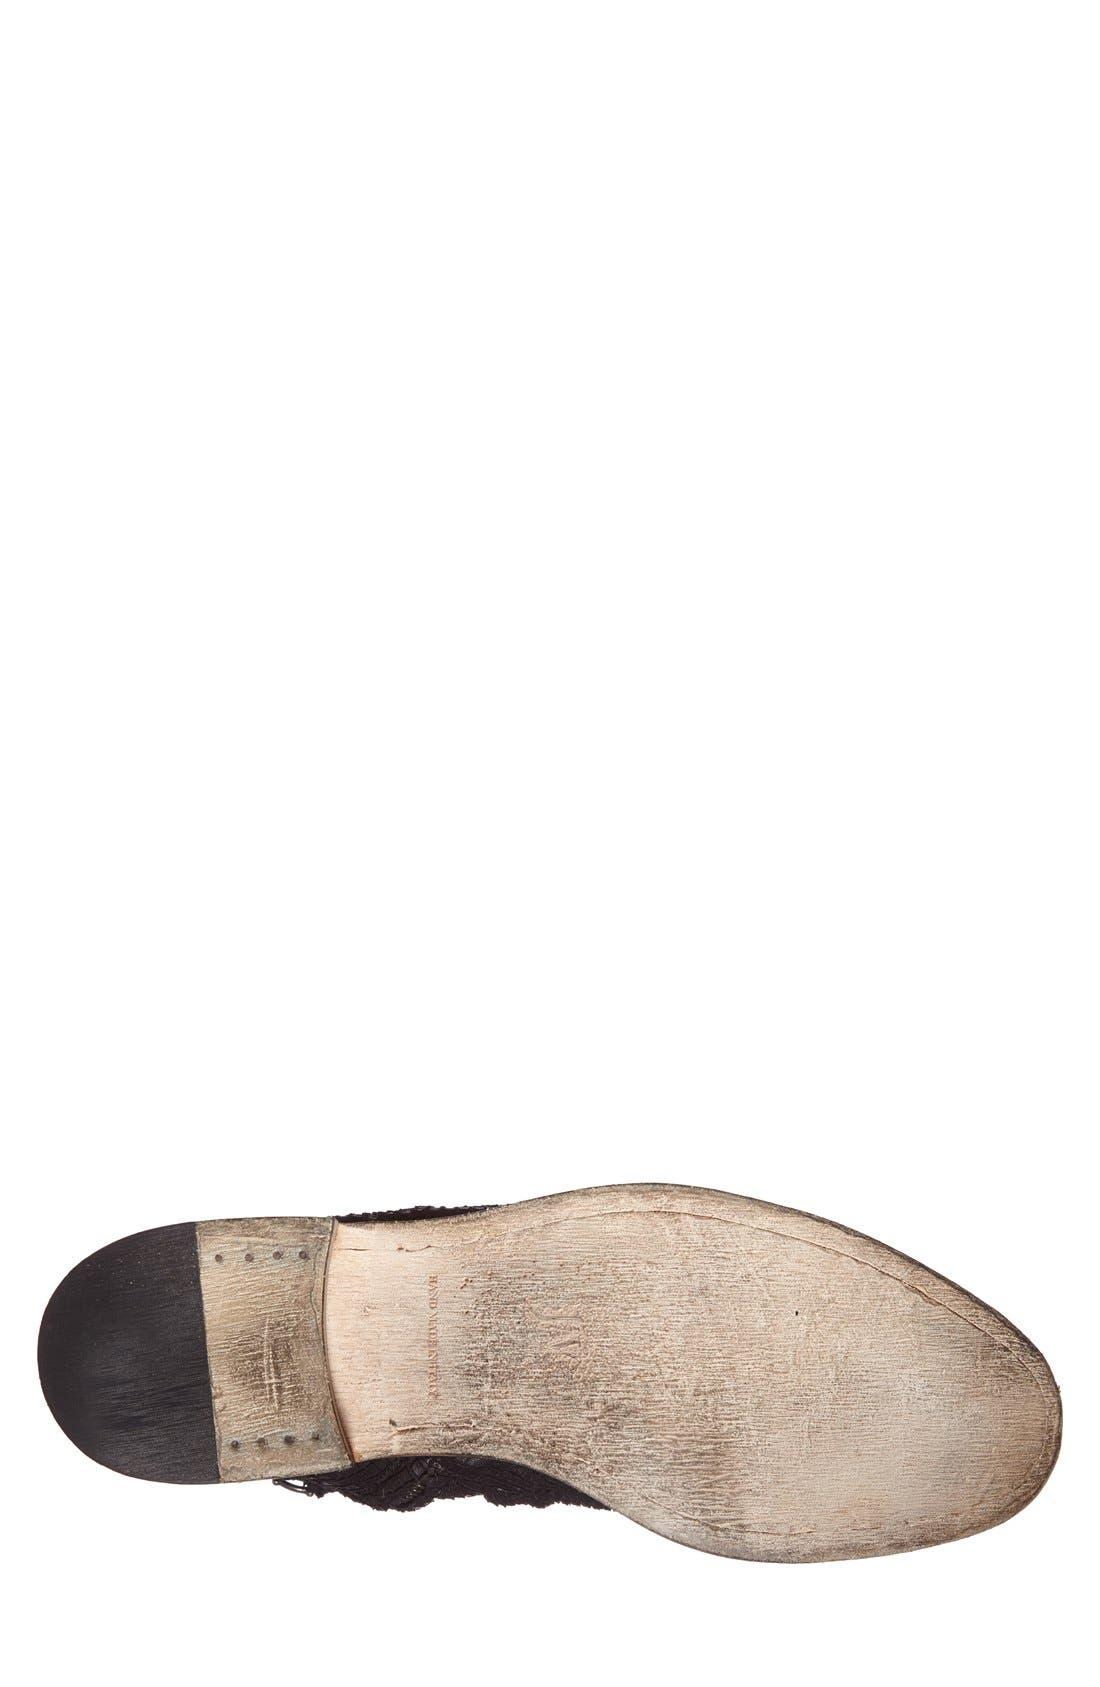 JOHN VARVATOS, Collection 'Richards - Sharpei' Zip Boot, Alternate thumbnail 4, color, 001